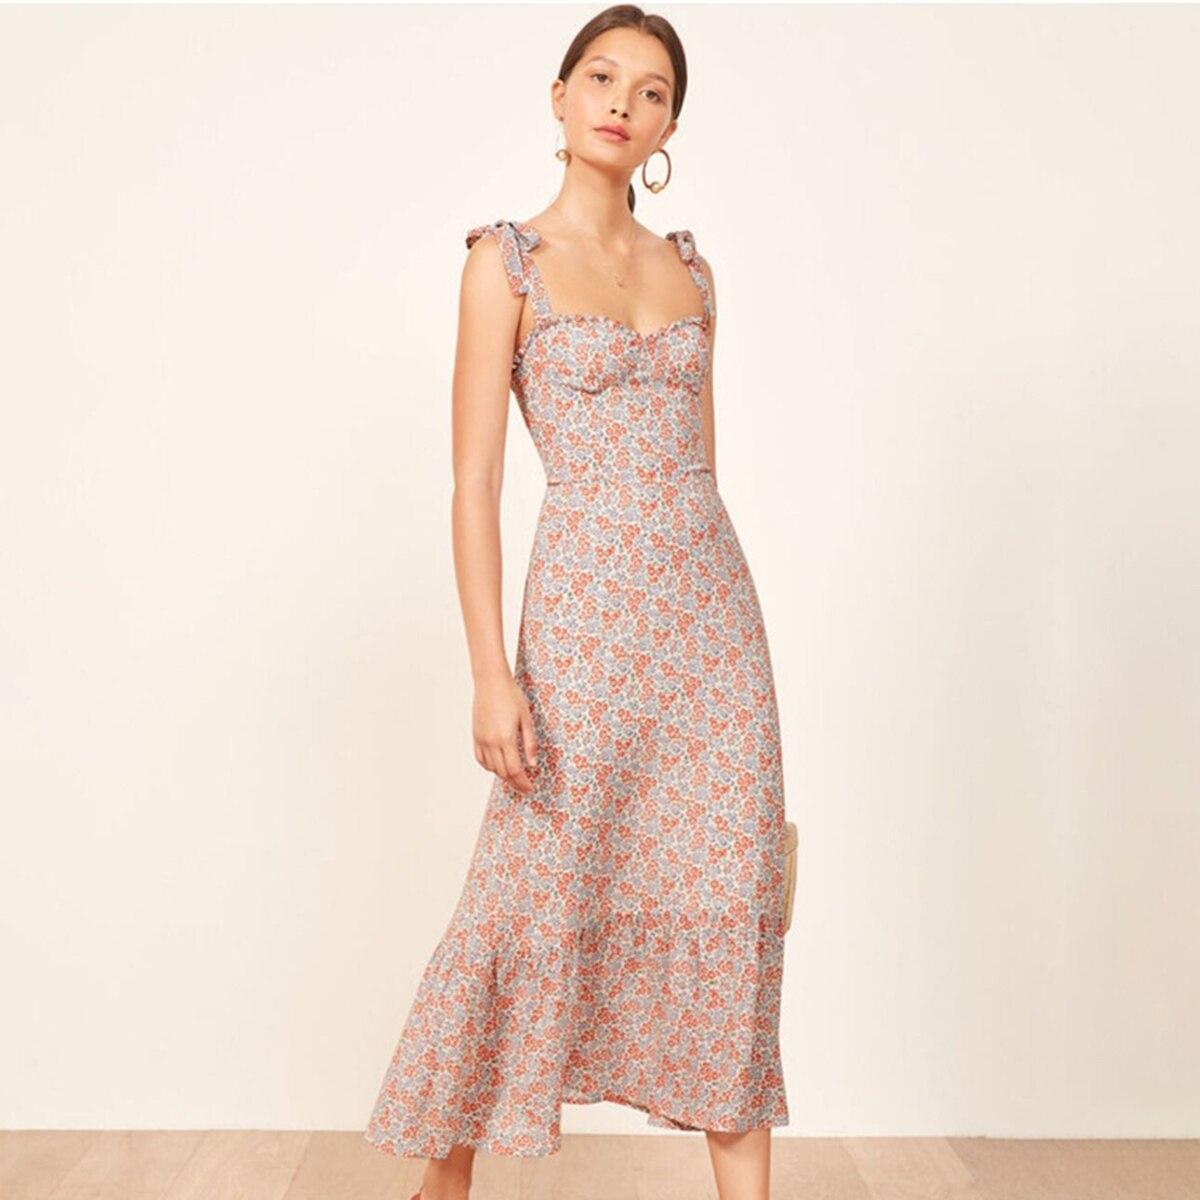 204d35396e2cc Nikita Ruffles Midi Dress Women Vintage 2019 Summer Strapless Sleeveless  Sexy Dress Ladies Floral Print Party Club Elegant Dress